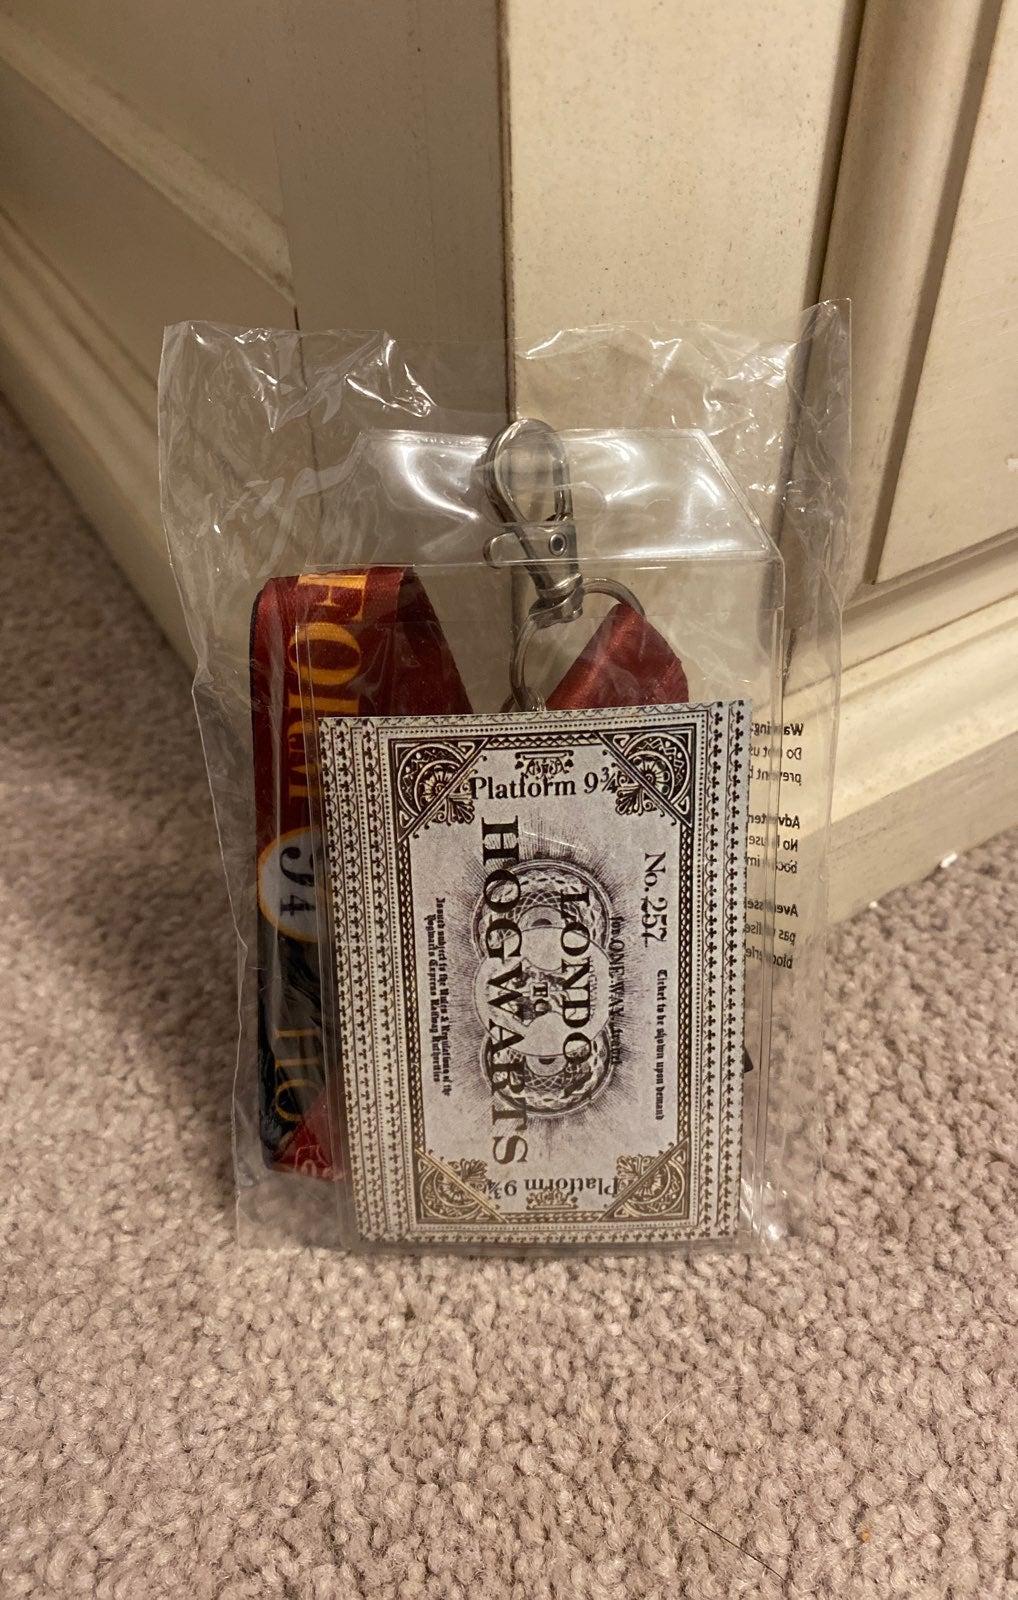 Harry Potter Hogwarts Express Lanyard